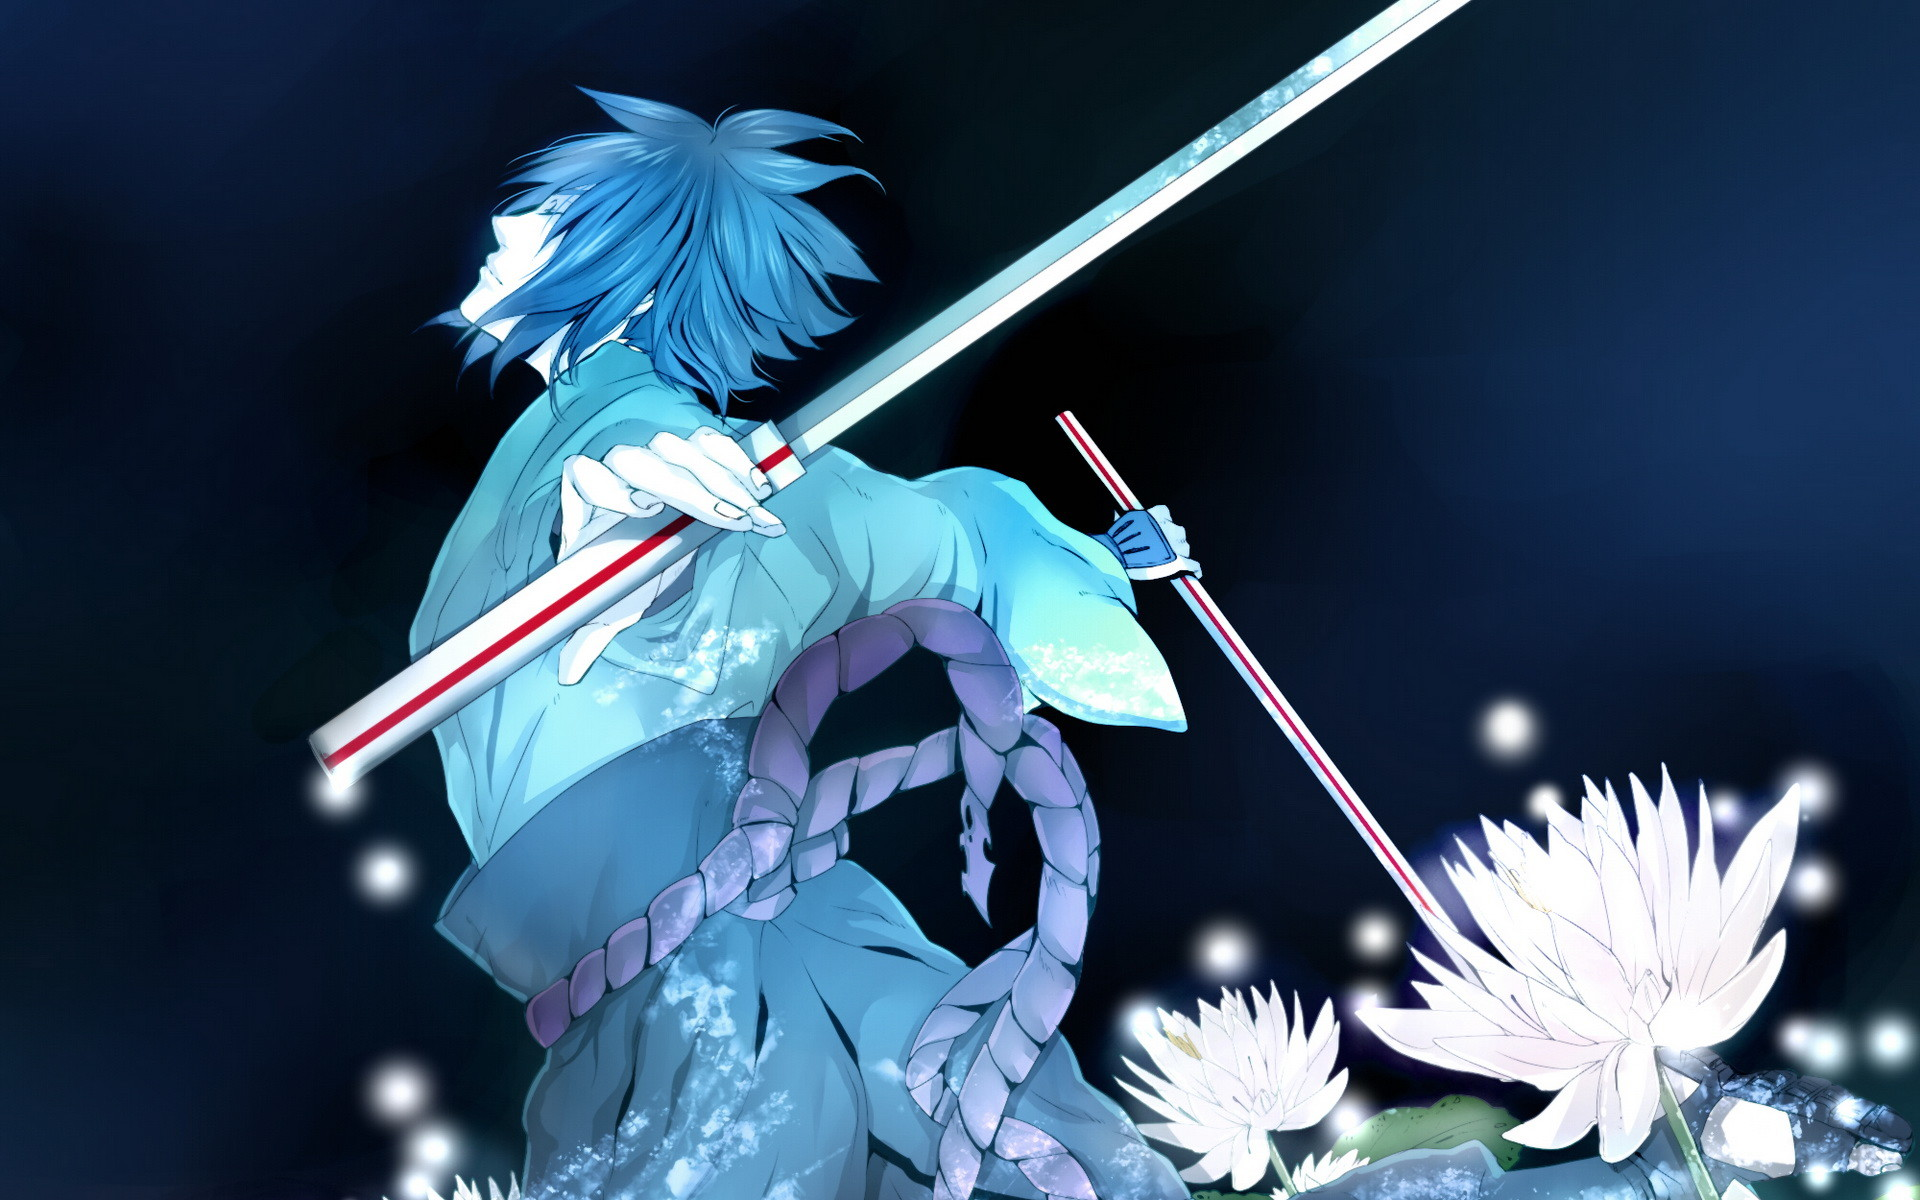 Naruto Uchiha sasuke Windows 8.1 Theme   All for Windows 10 Free